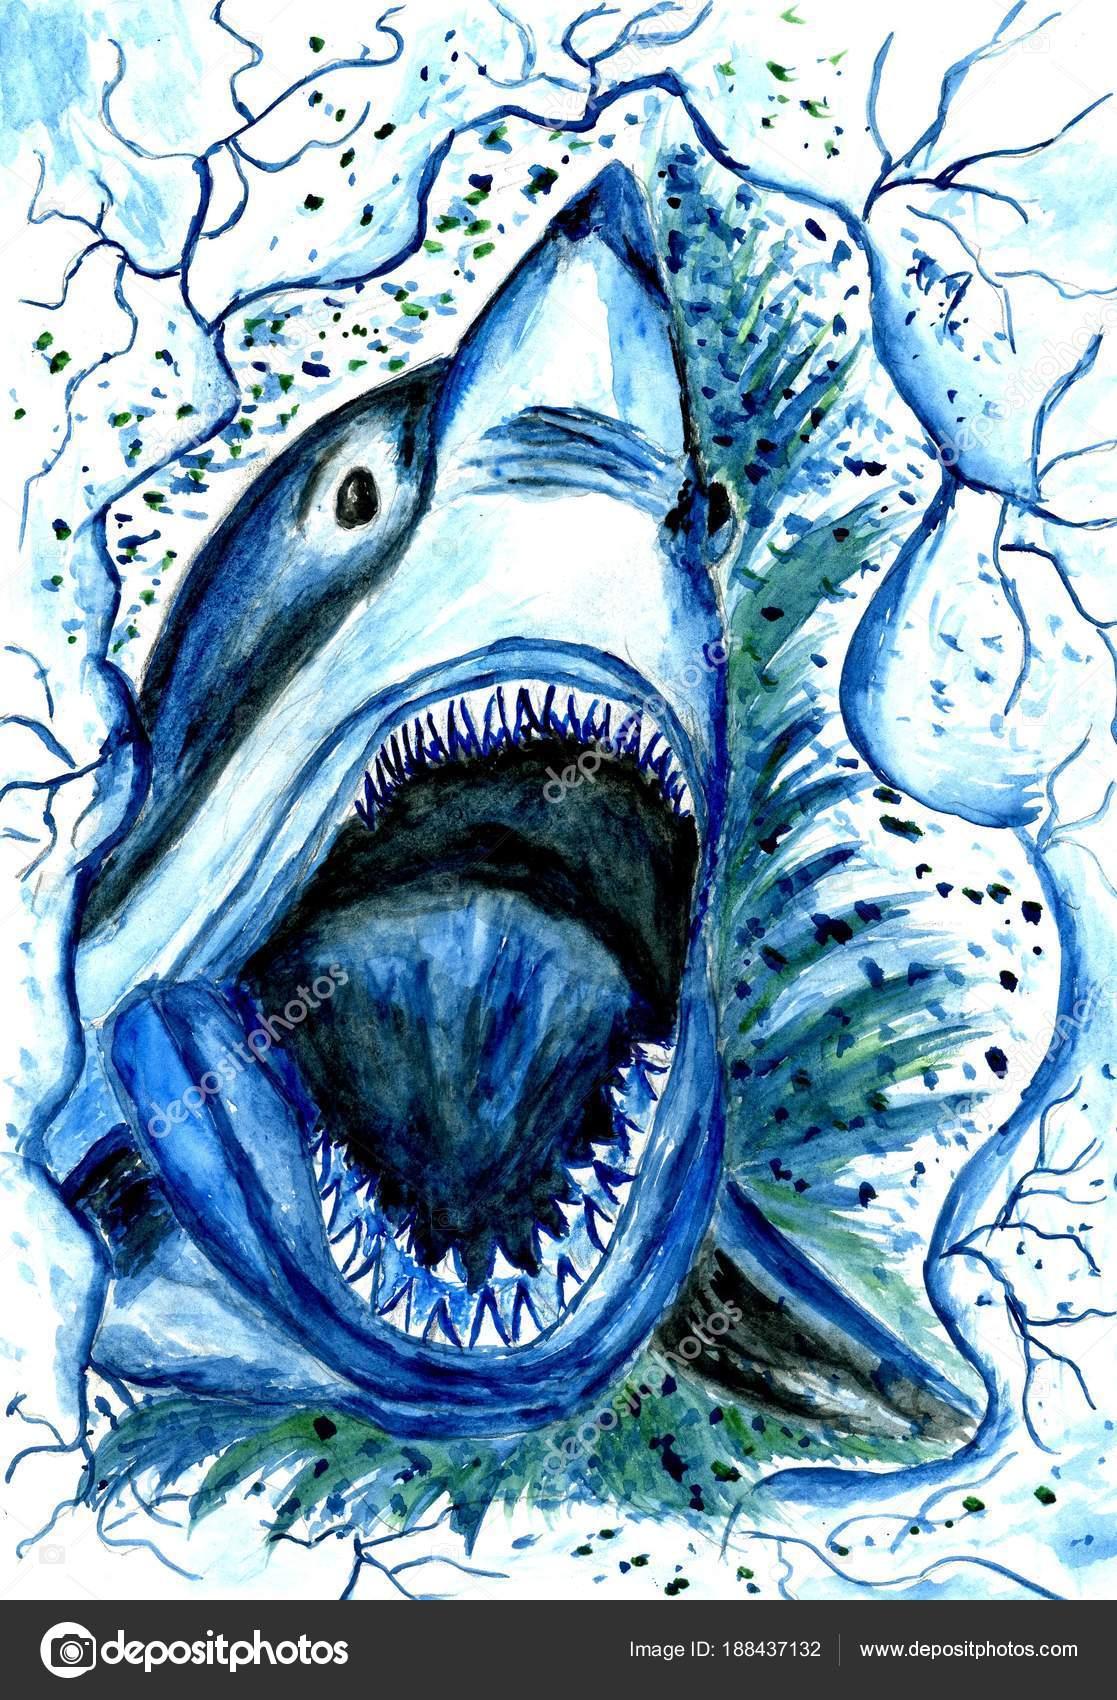 Dessin requin affam photographie artshock 188437132 - Modele dessin requin ...